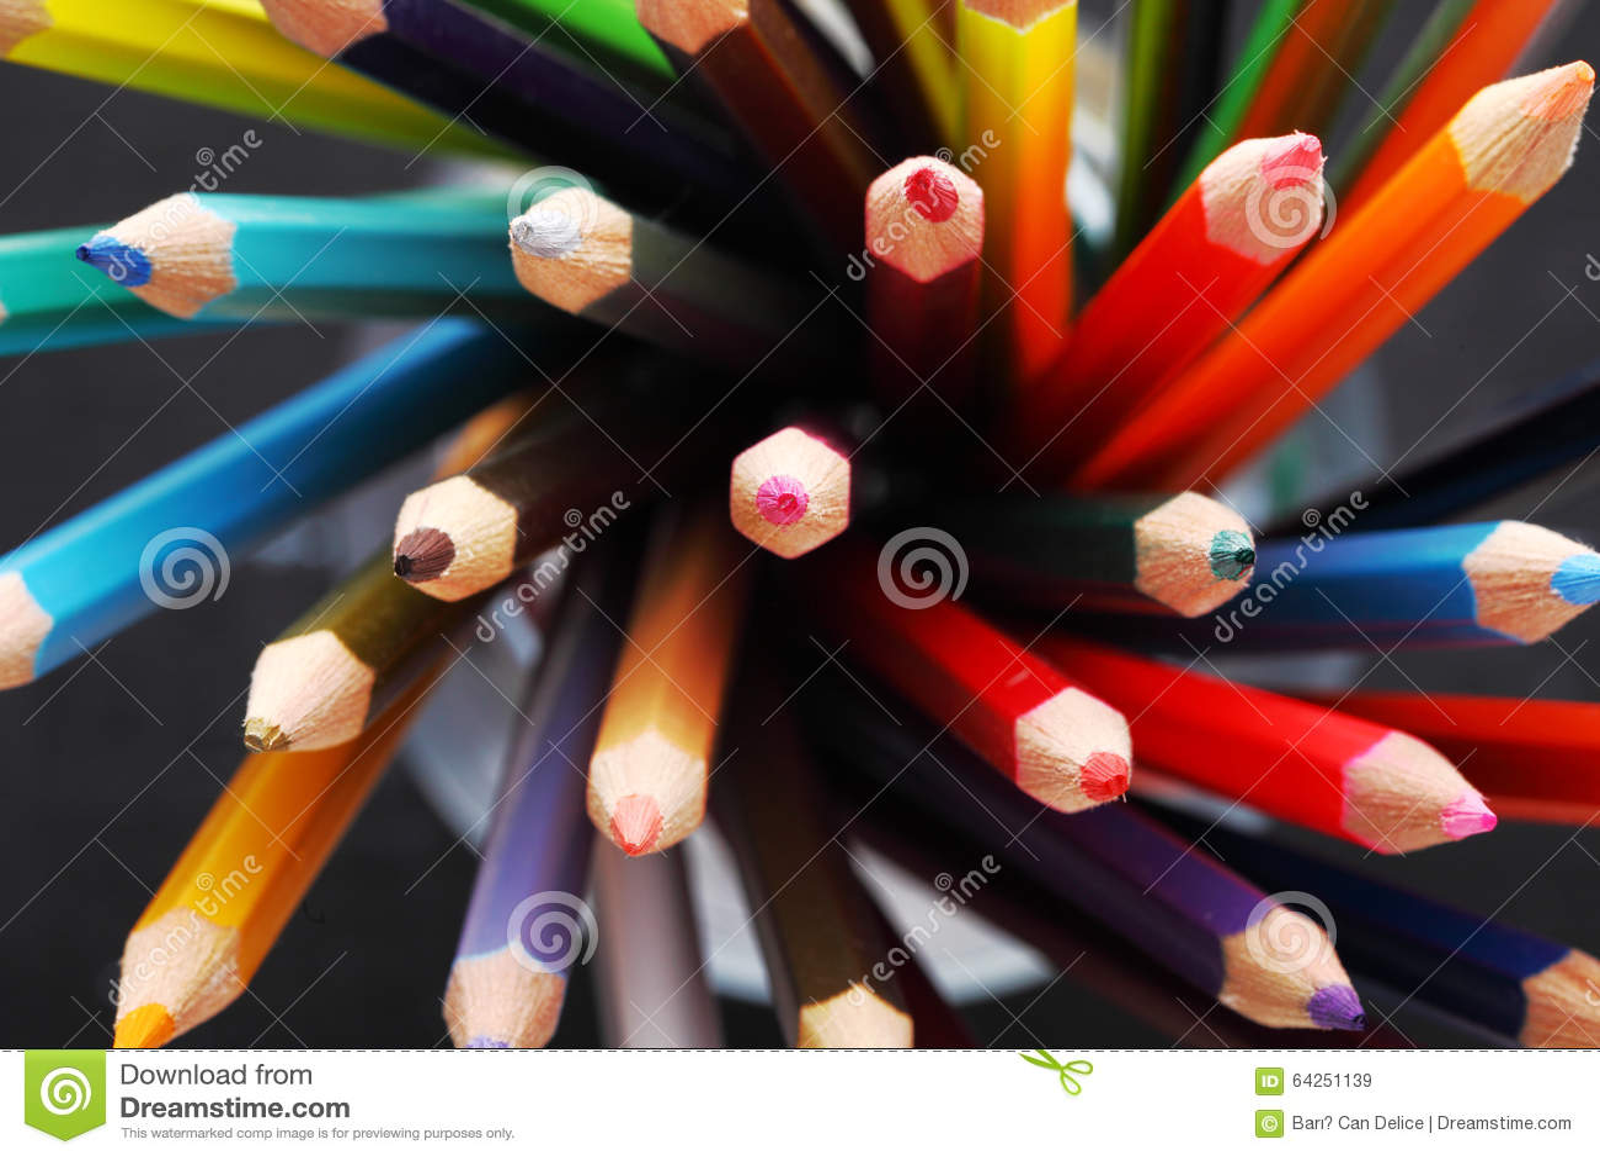 Färgrika blyertspennor i en blyertspennaask